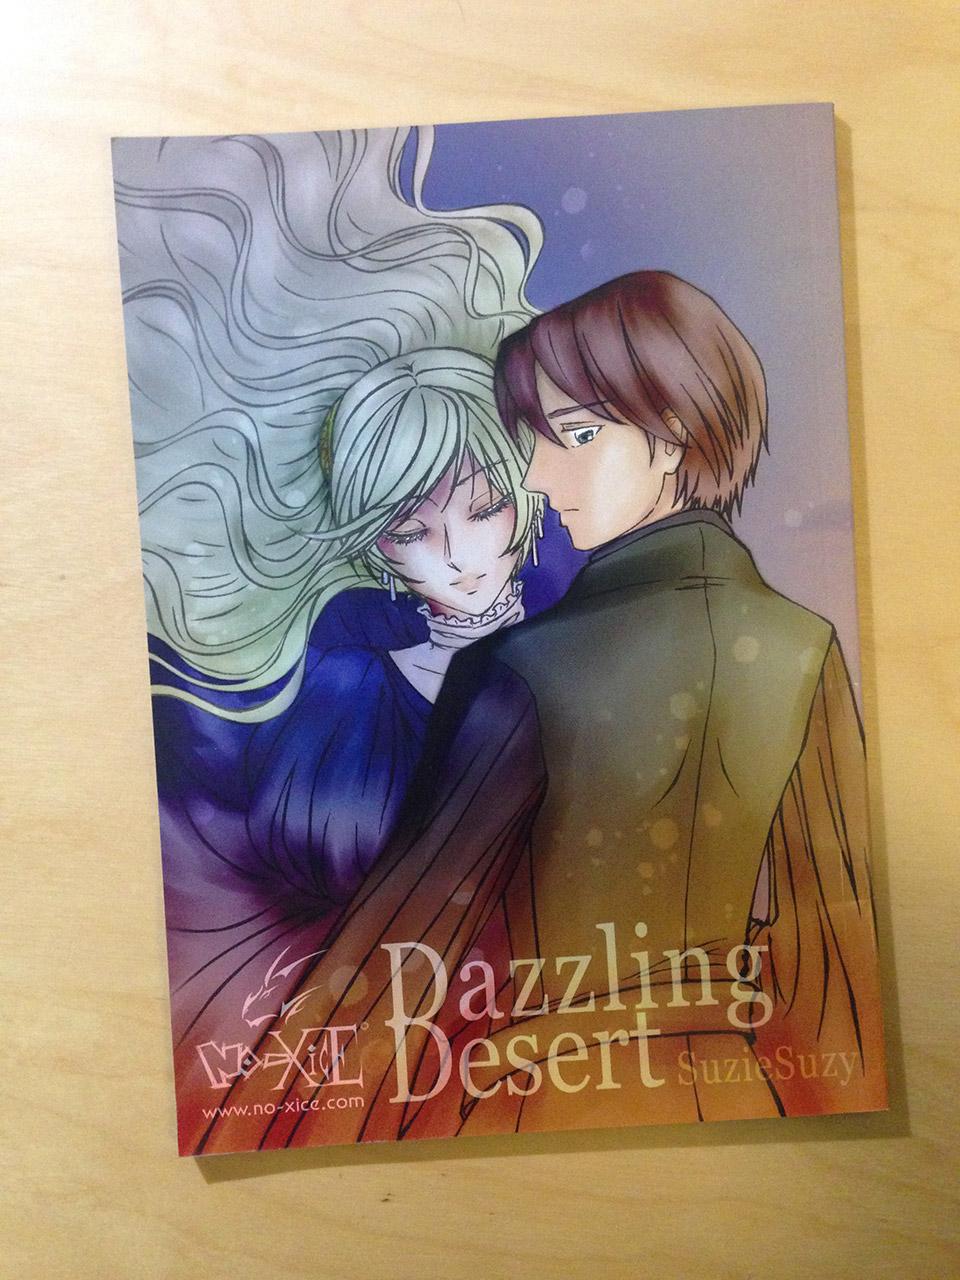 dazzling desert suziesuzy manga noxice